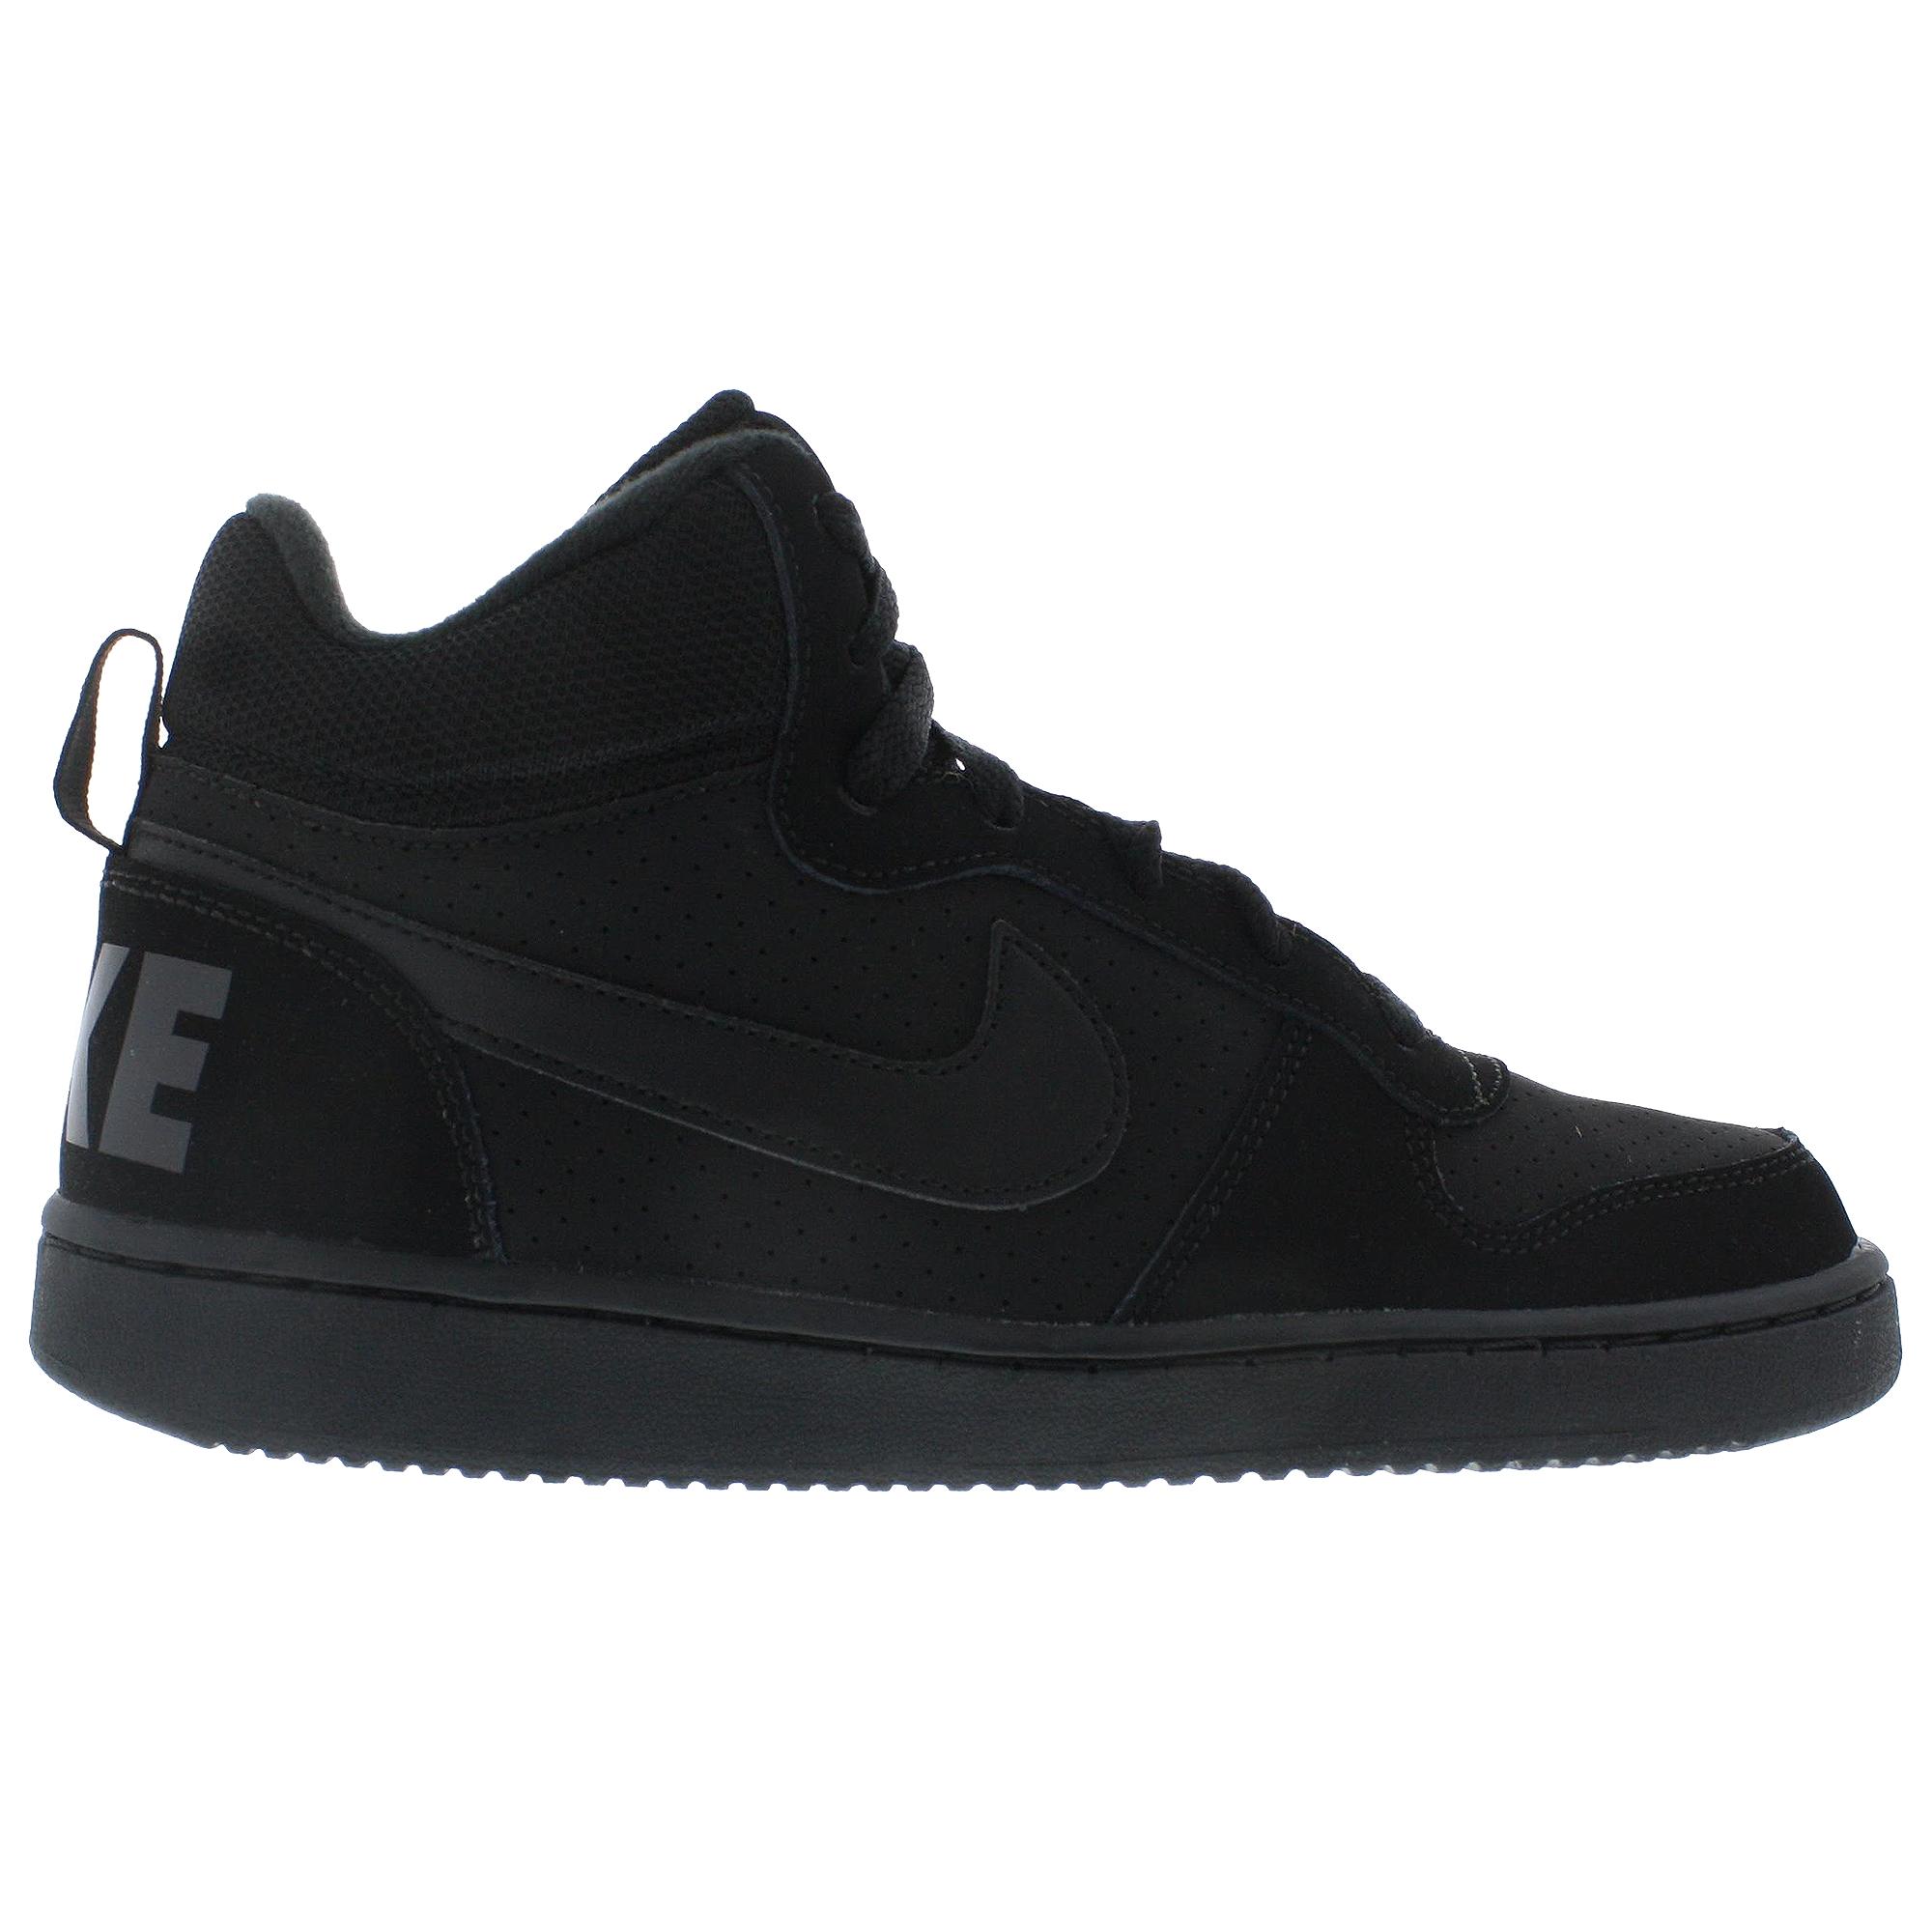 40608503fe4 Nike Court Borough Mid (Gs) Spor Ayakkabı  839977-001 - Barcin.com